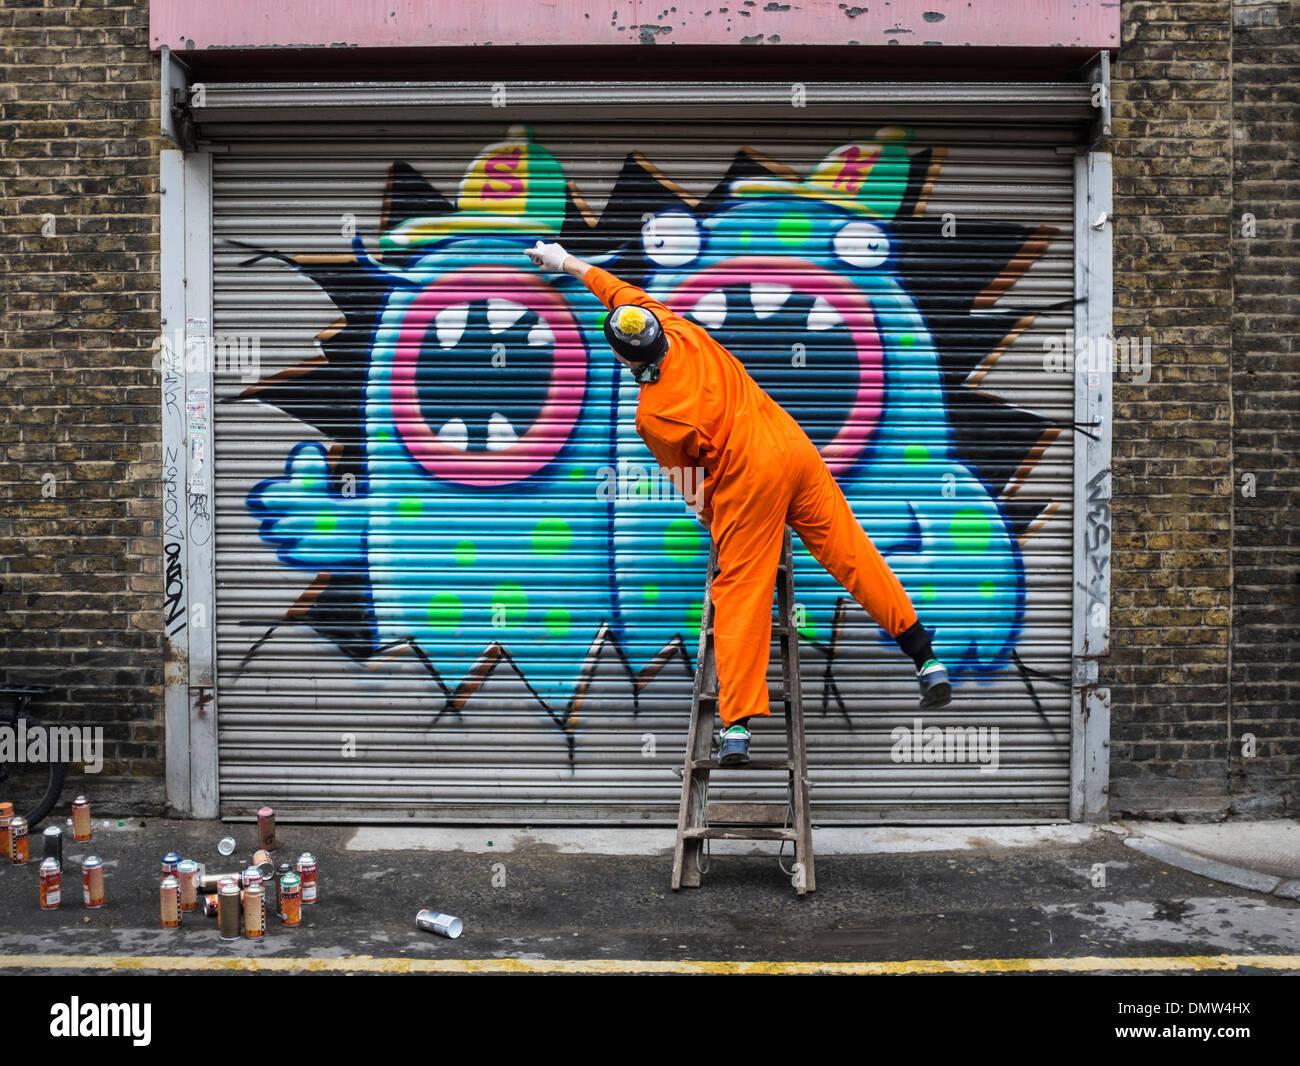 street-artist-ronzo-at-work-artist-uses-spray-paints-to-paint-giant-DMW4HX.jpg